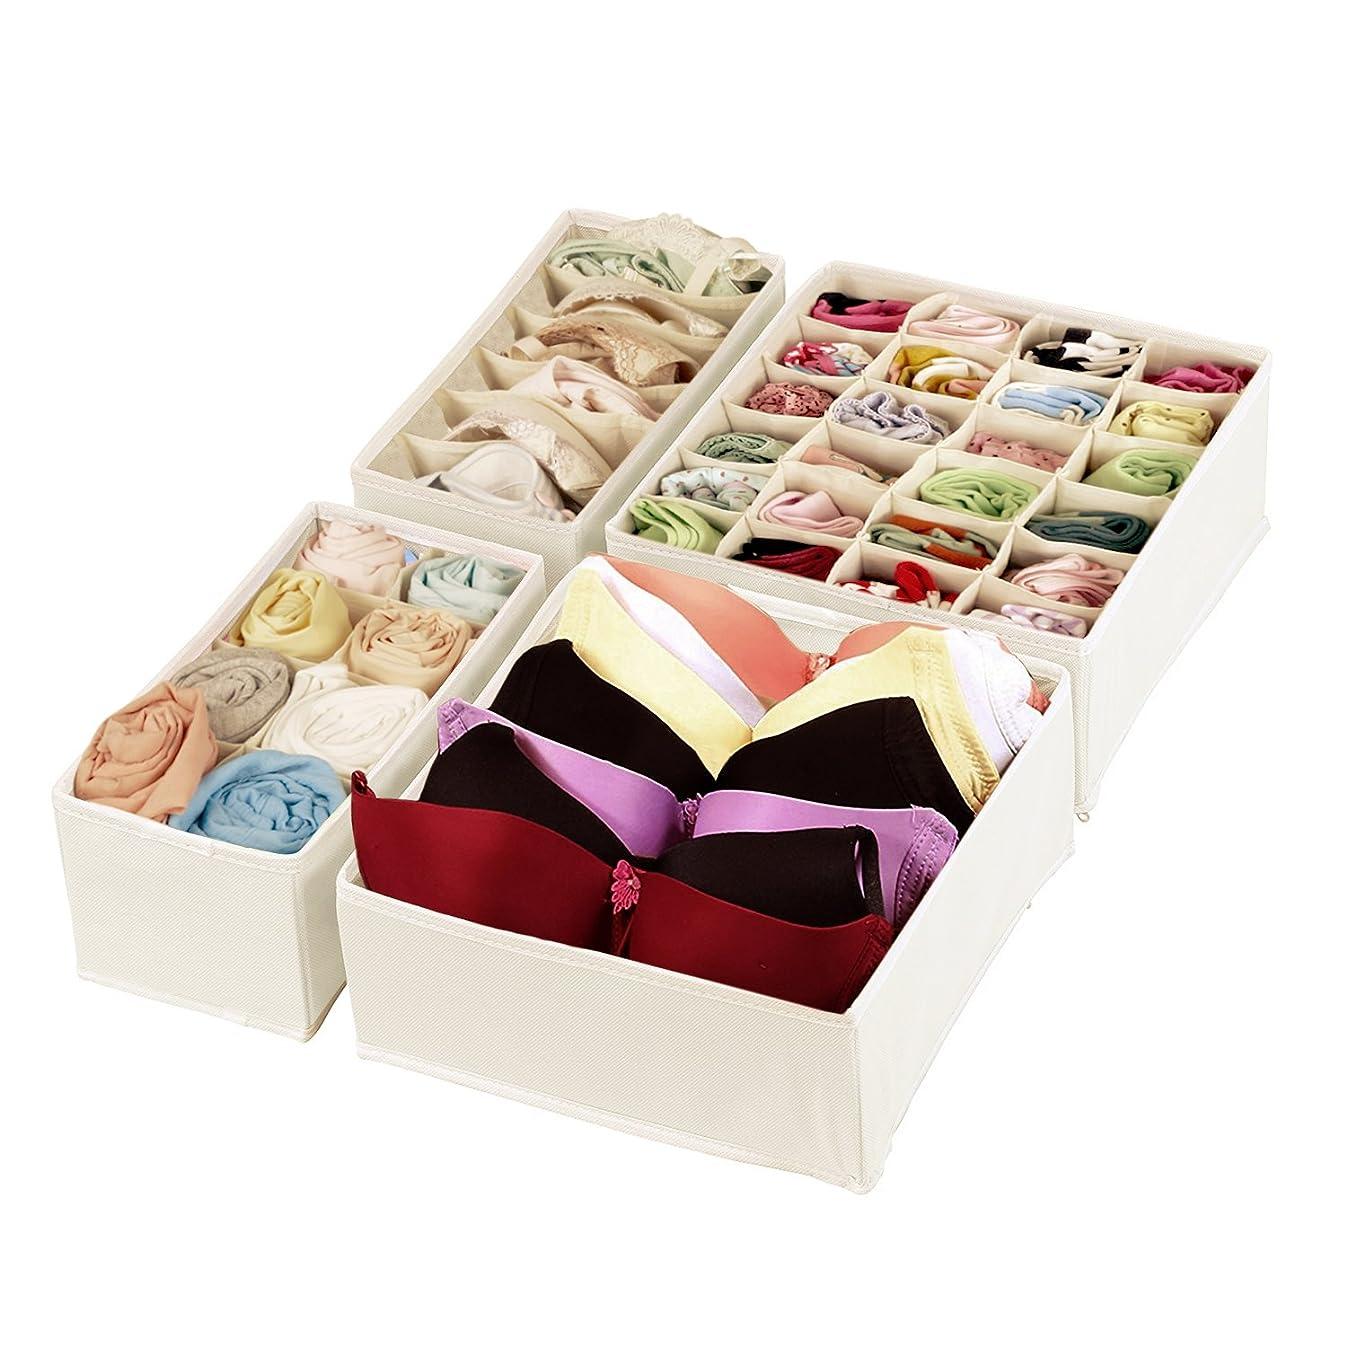 Magicfly Bra Organizer, Closet Underwear Organizer, Upgrade Sturdy Collapsible Drawer Divider for Socks Panties Bra Ties Clothing, Set of 4, Beige